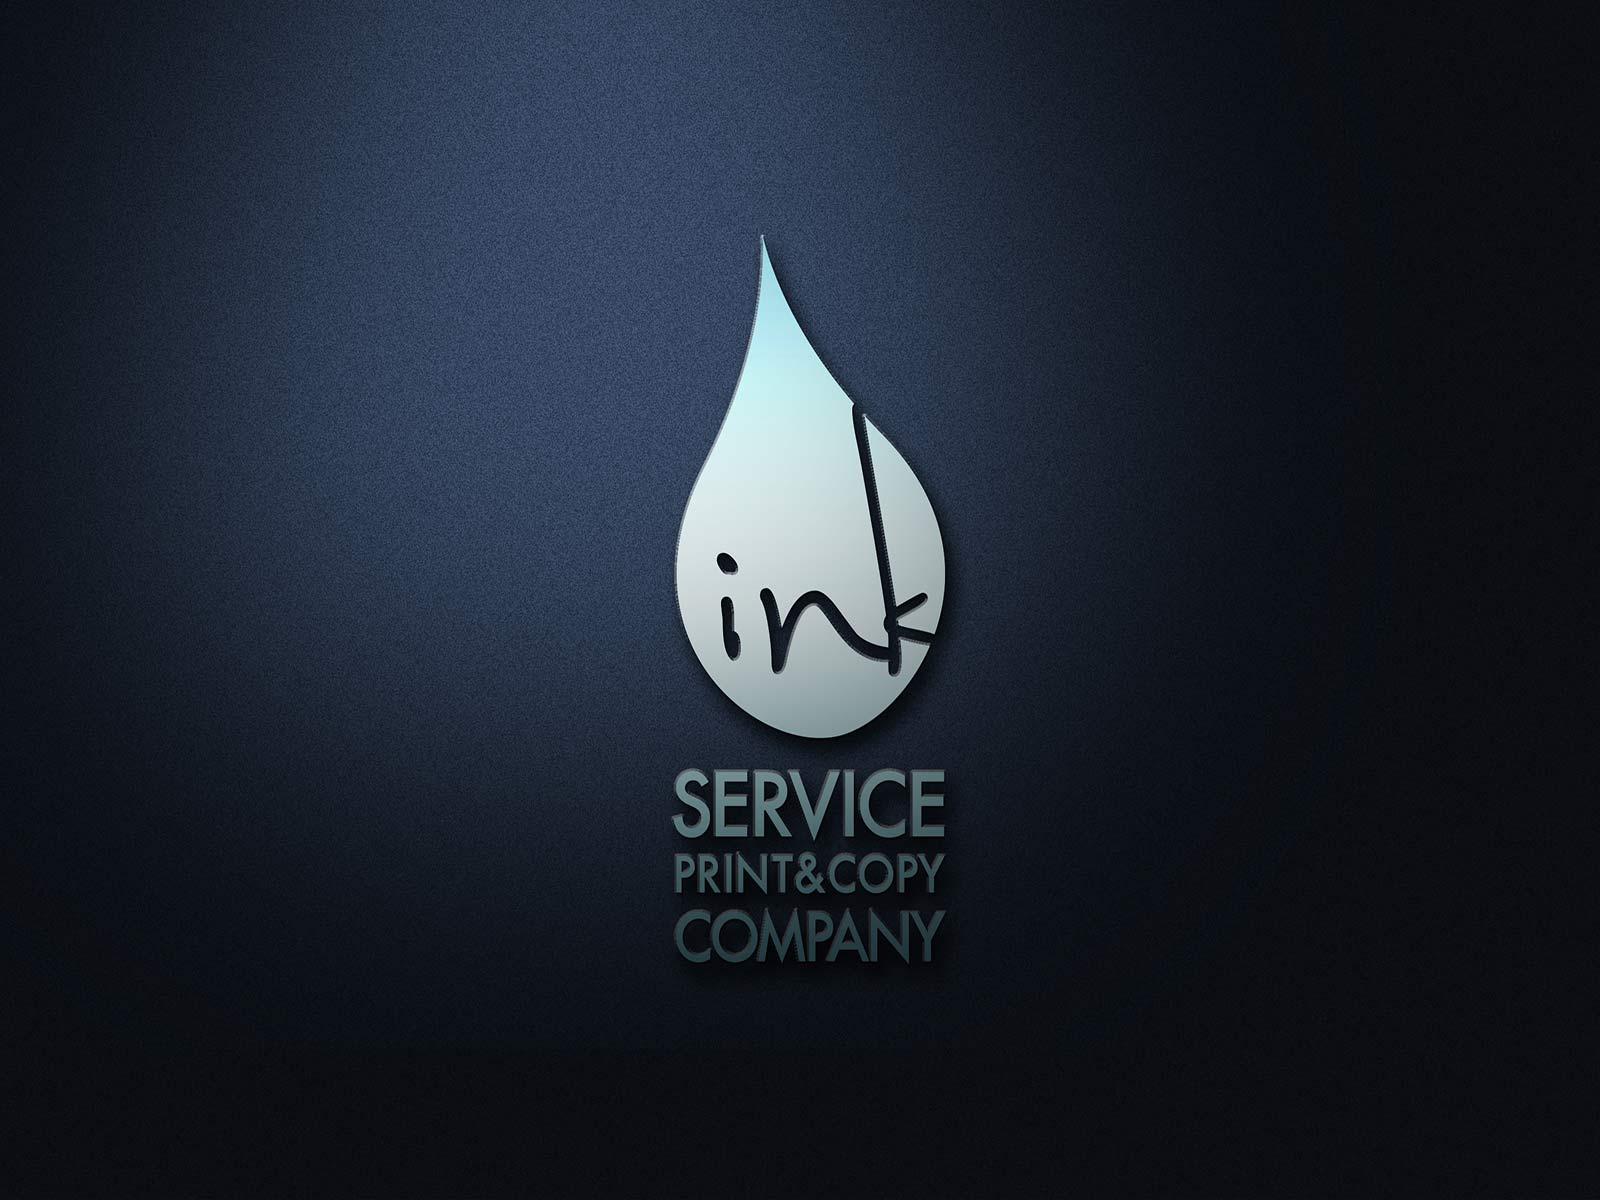 logo_01_inkservice-kuwait